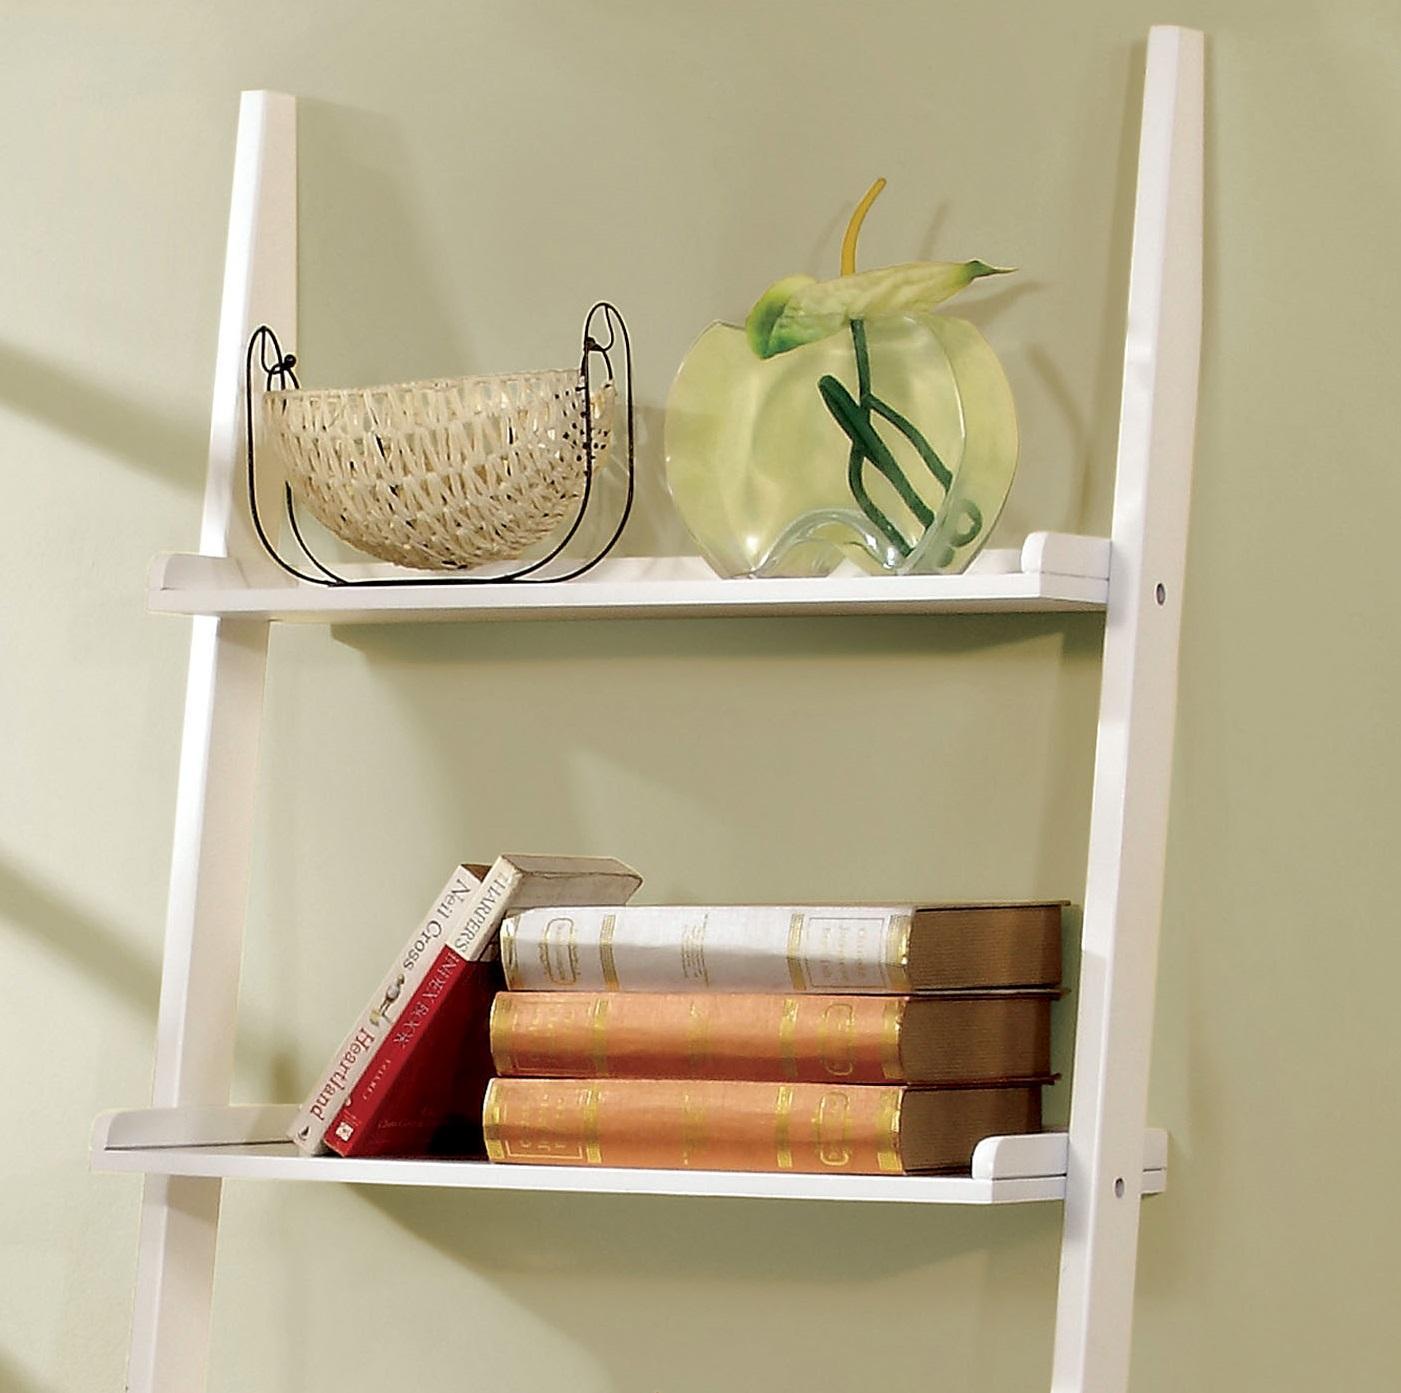 Furniture Of America Klaudalie 5 Tier Ladder Style Bookshelf, Tray Style  Shelf